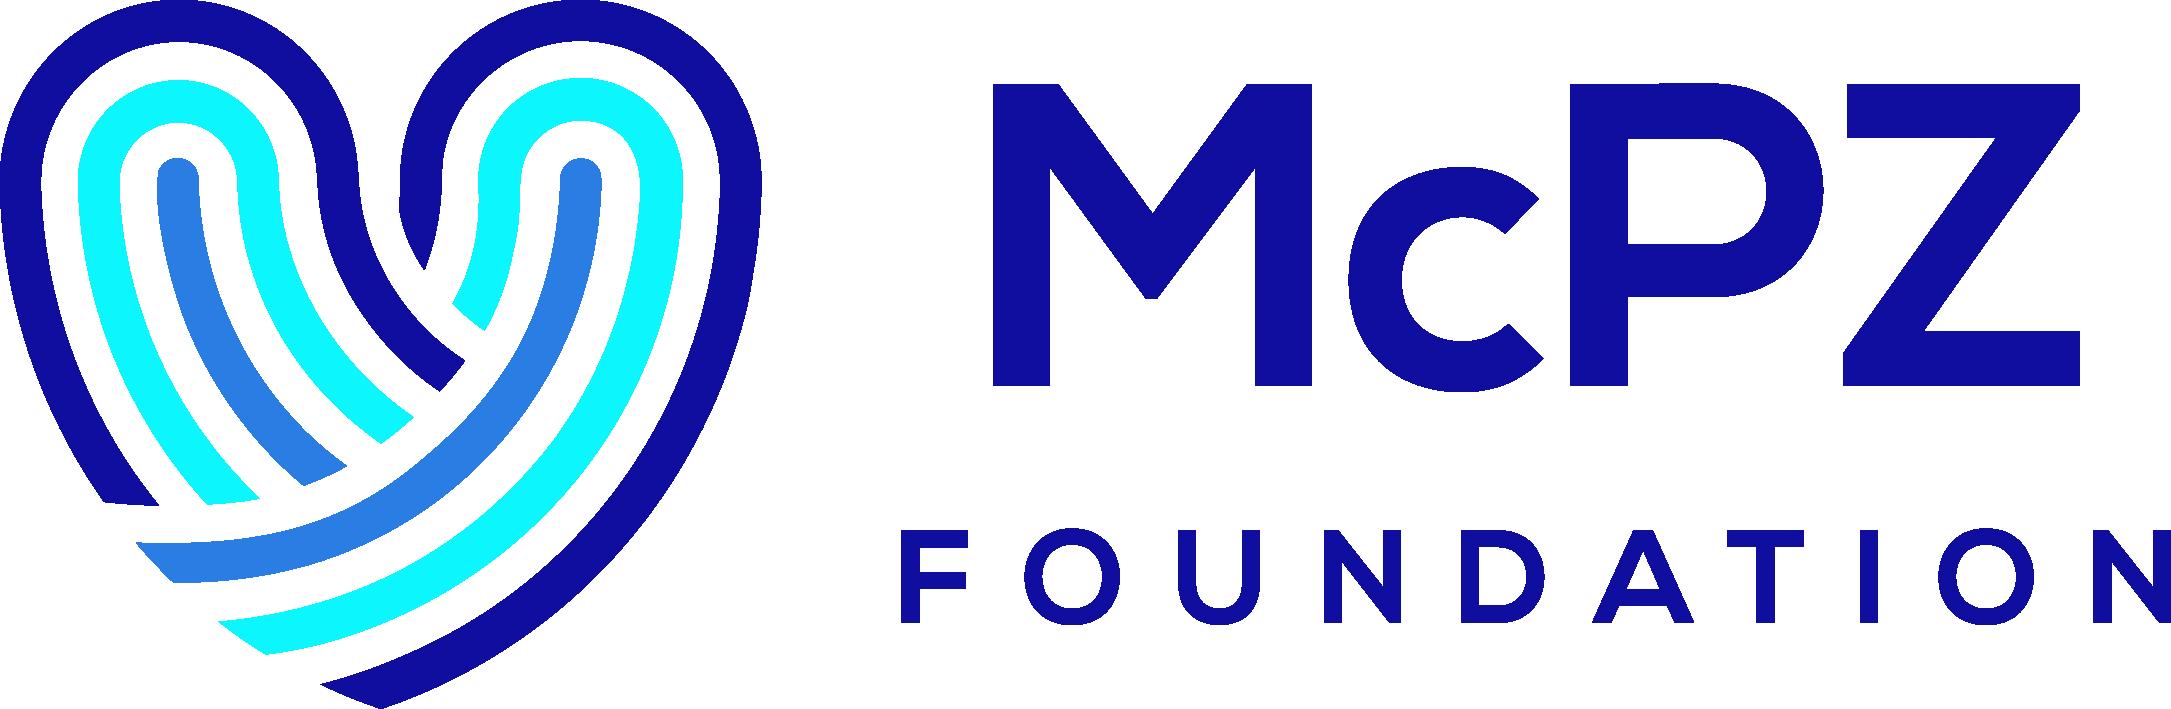 McPZ Foundation